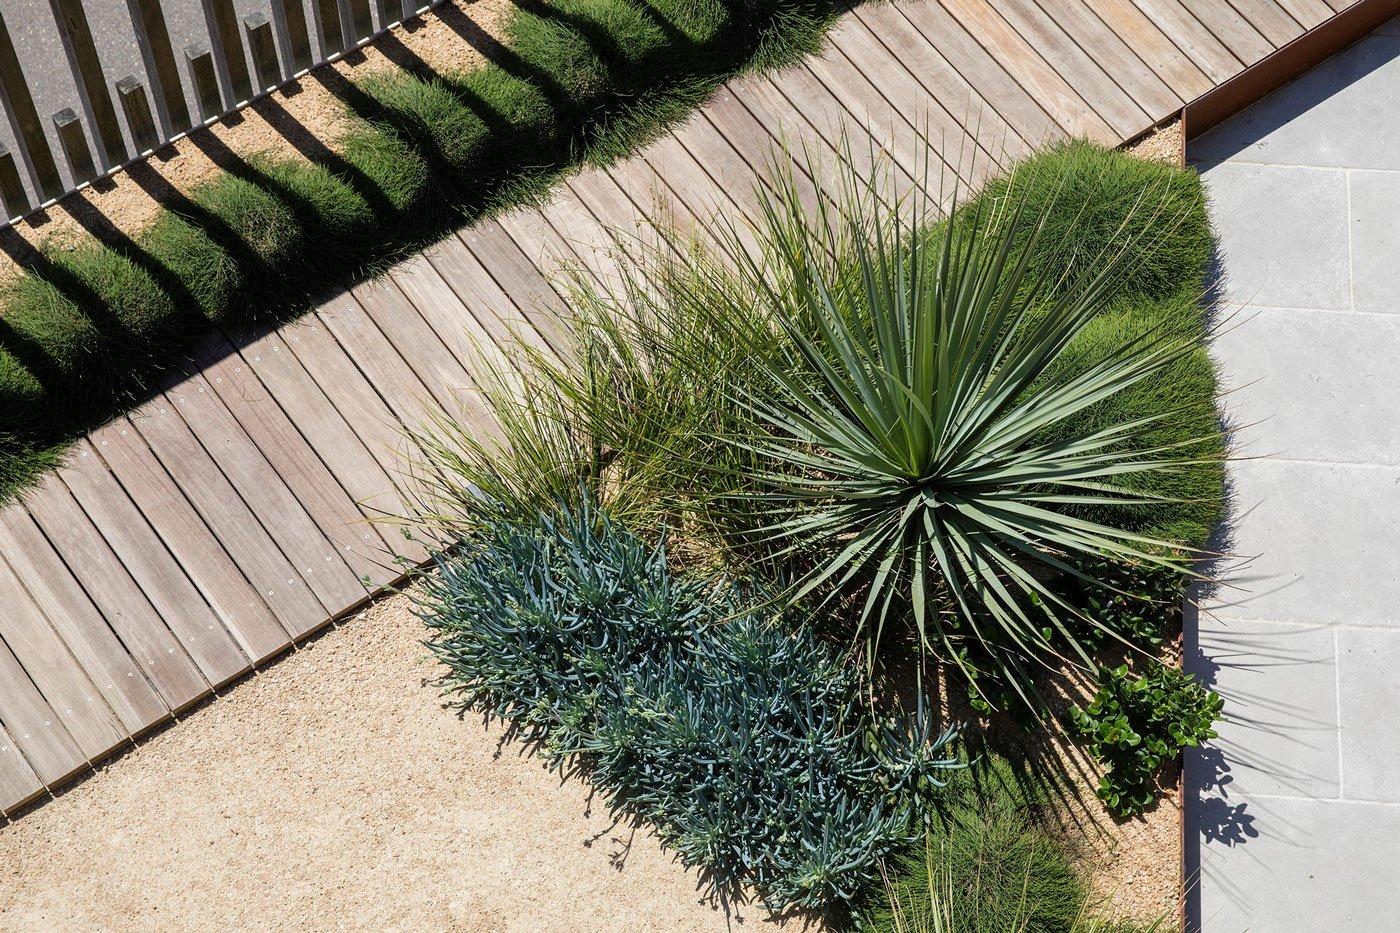 Hardwood timber boardwalk with Nolina Nelsonii plant